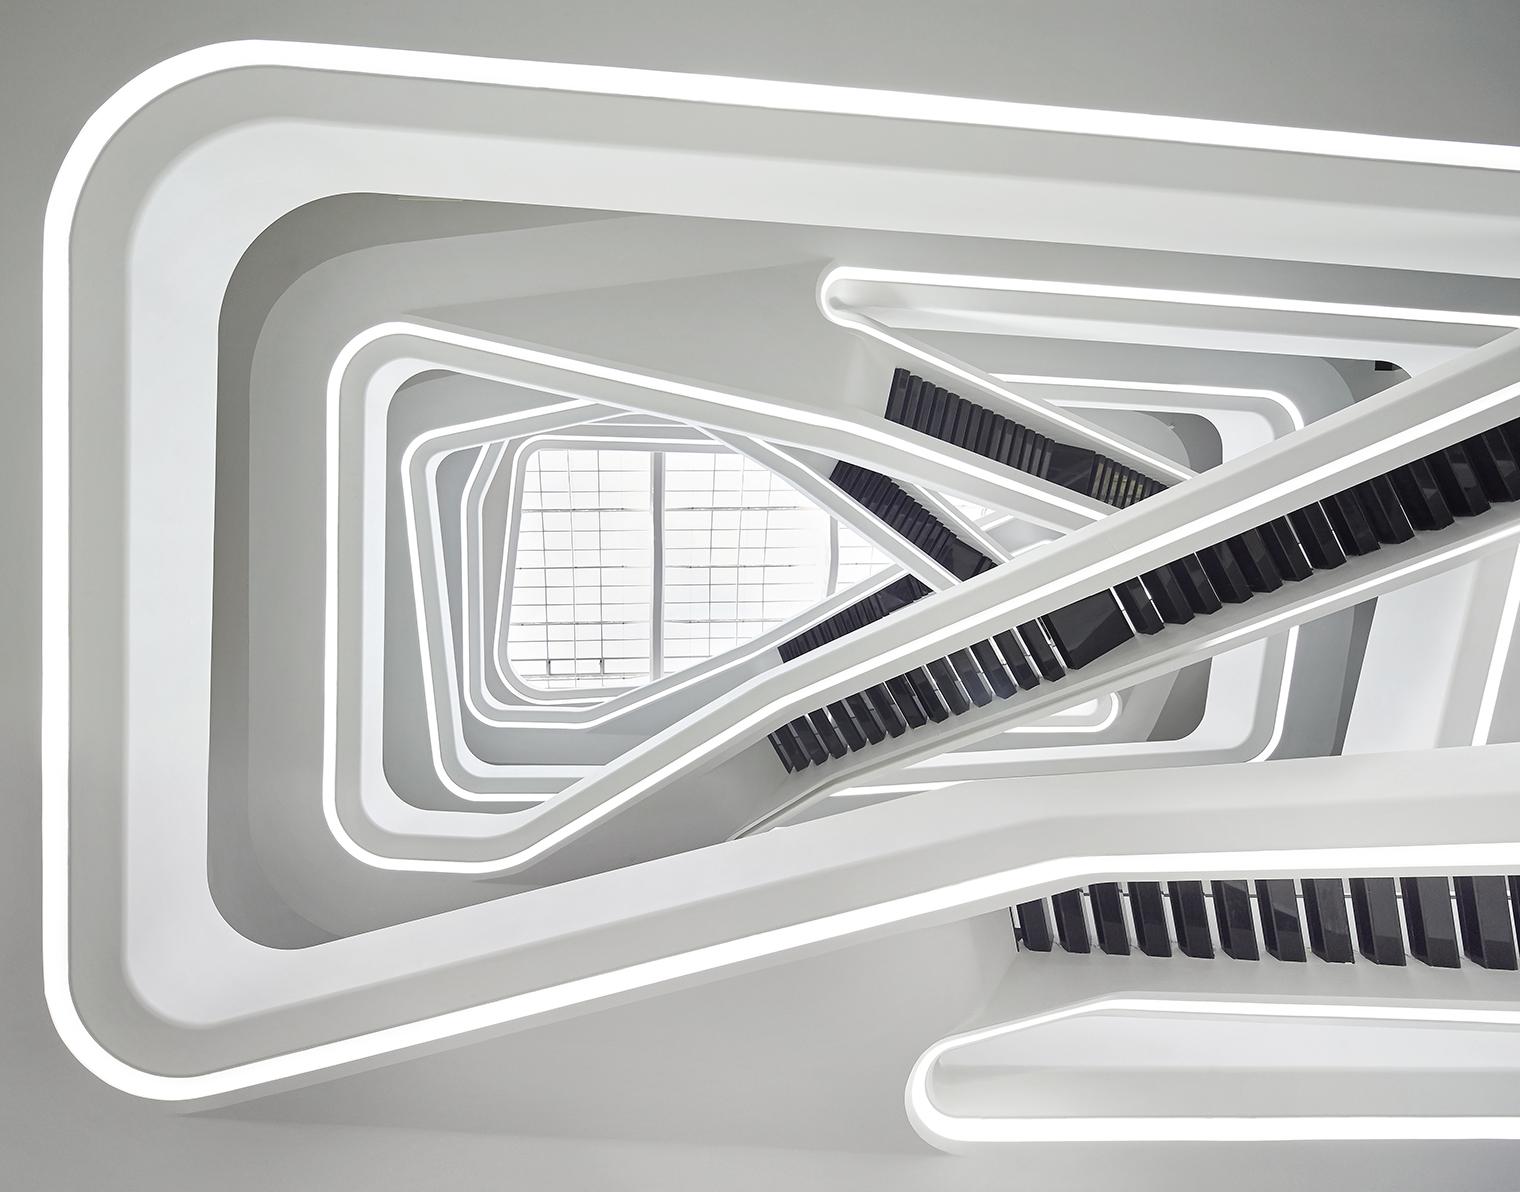 Zaha Hadid Archivos Diariodesign Com # Muebles De Zaha Hadid